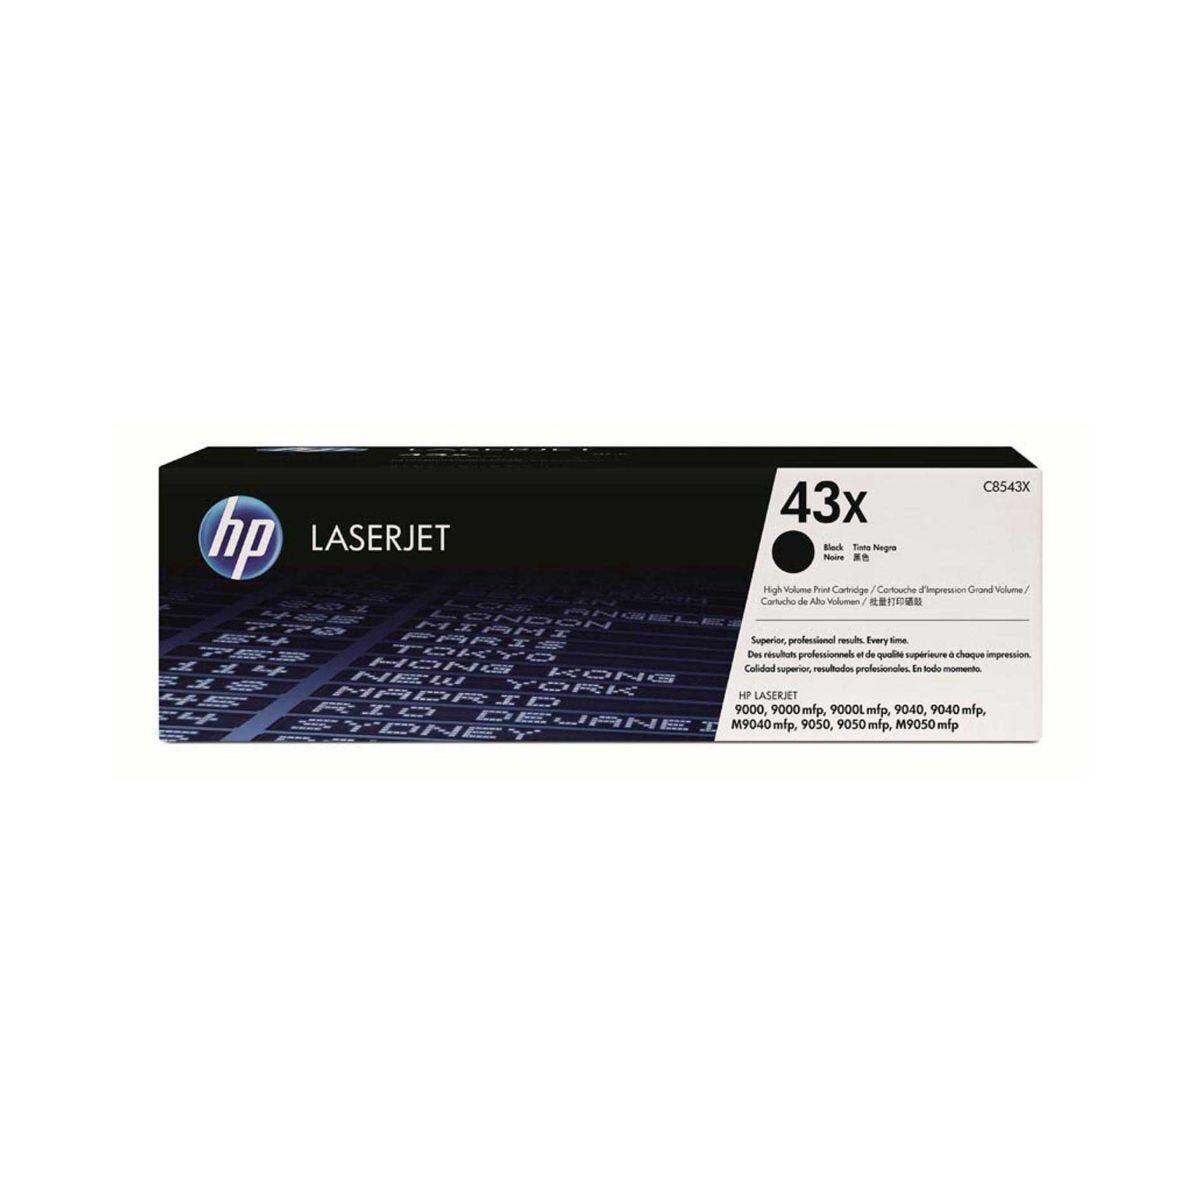 HP 43X Laserjet Printer Ink Toner Cartridge C8543X